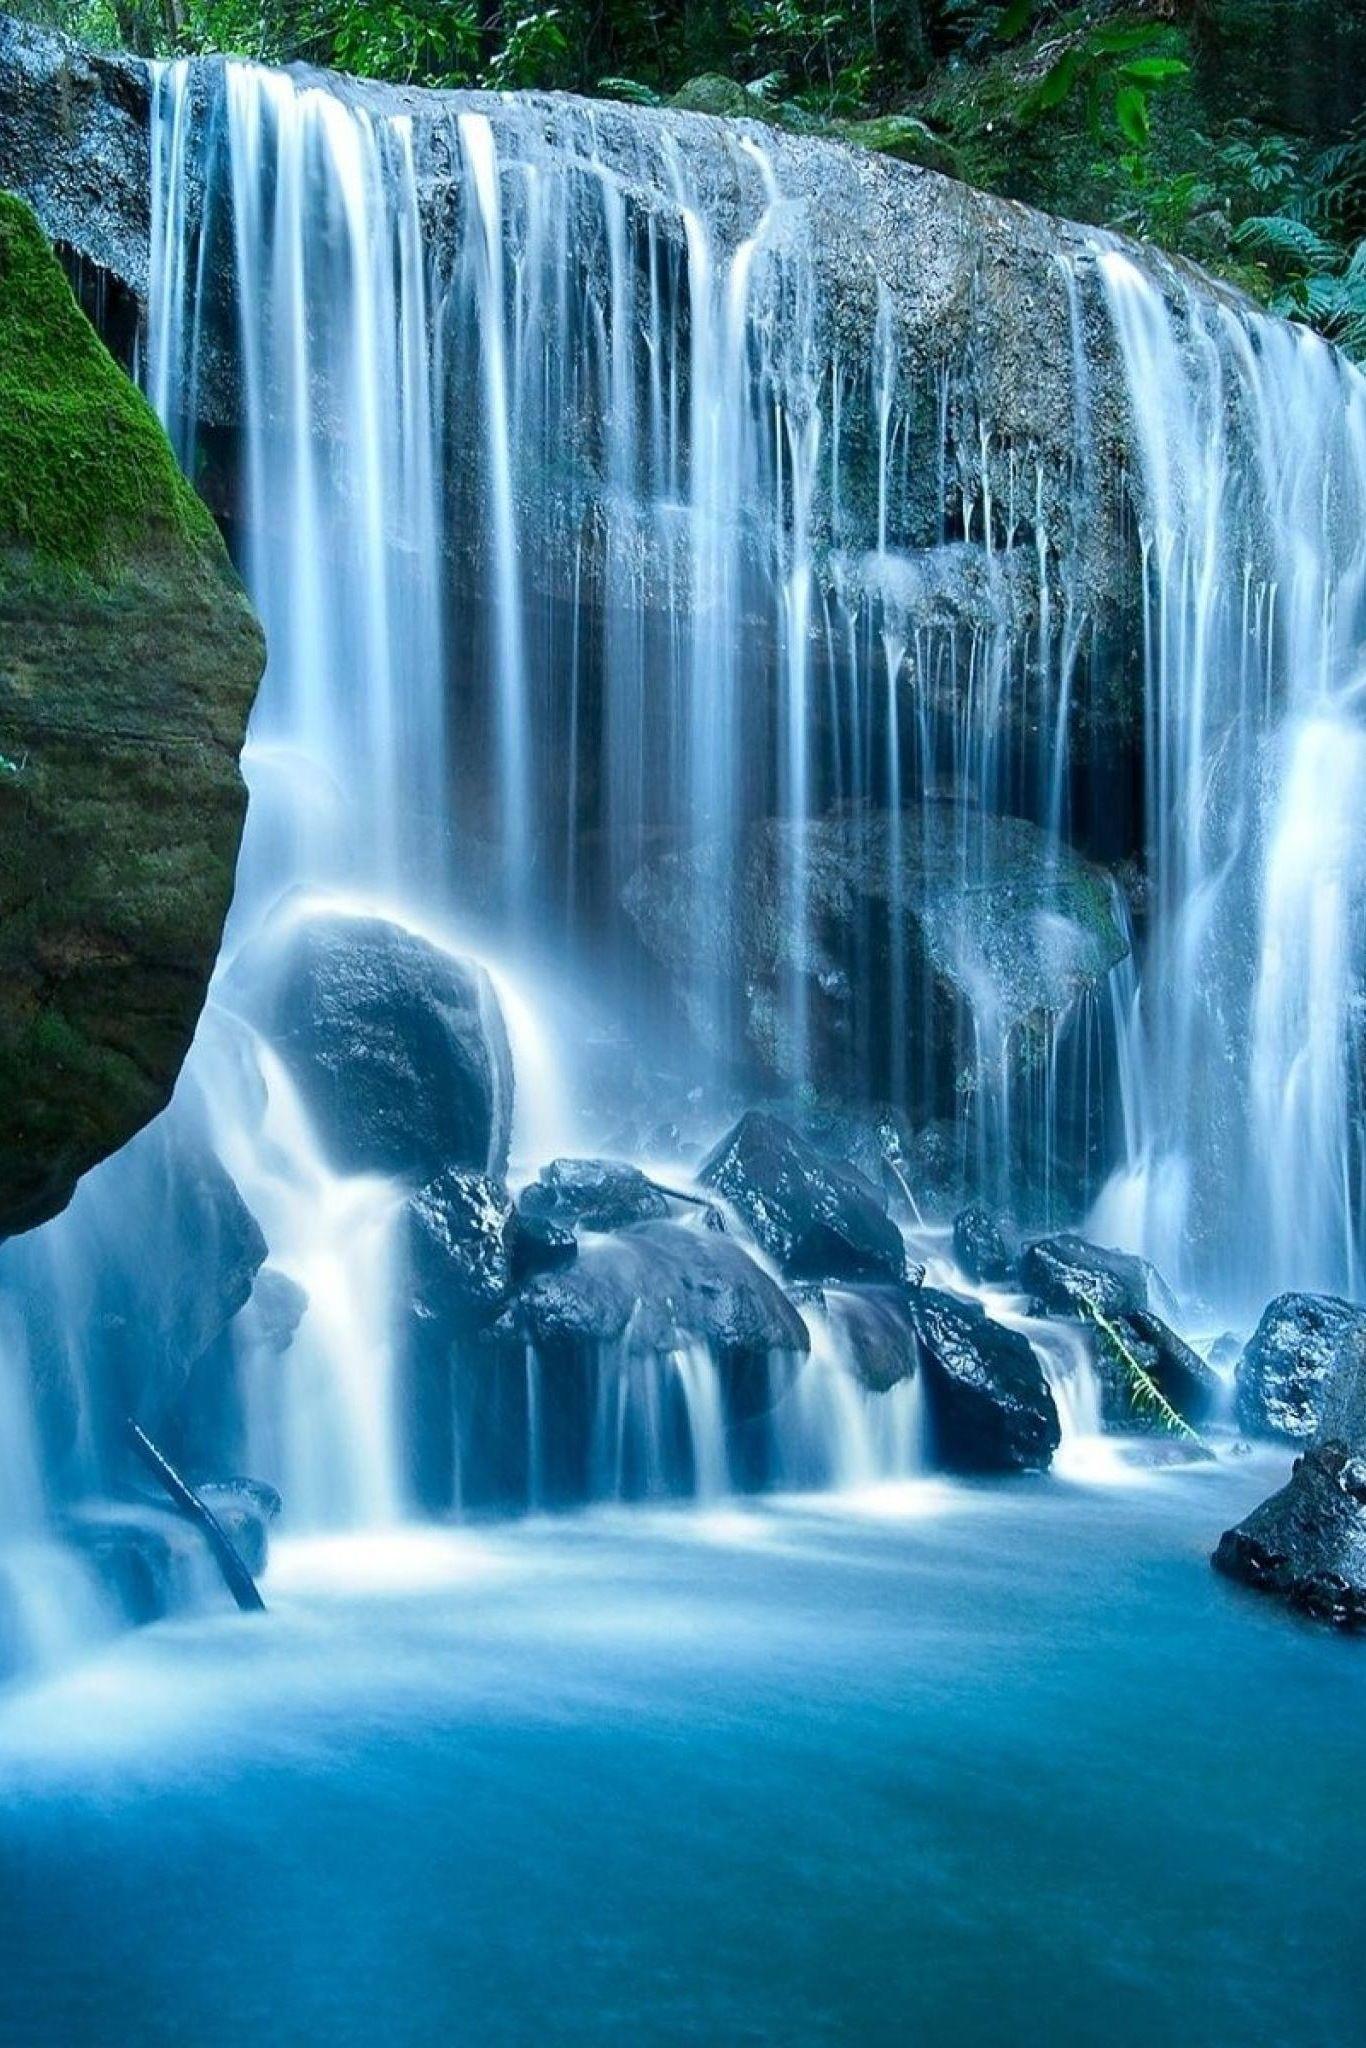 Super Awesome Scene The Best Scene Ever Waterfall Wallpaper Waterfall Mountain Waterfall